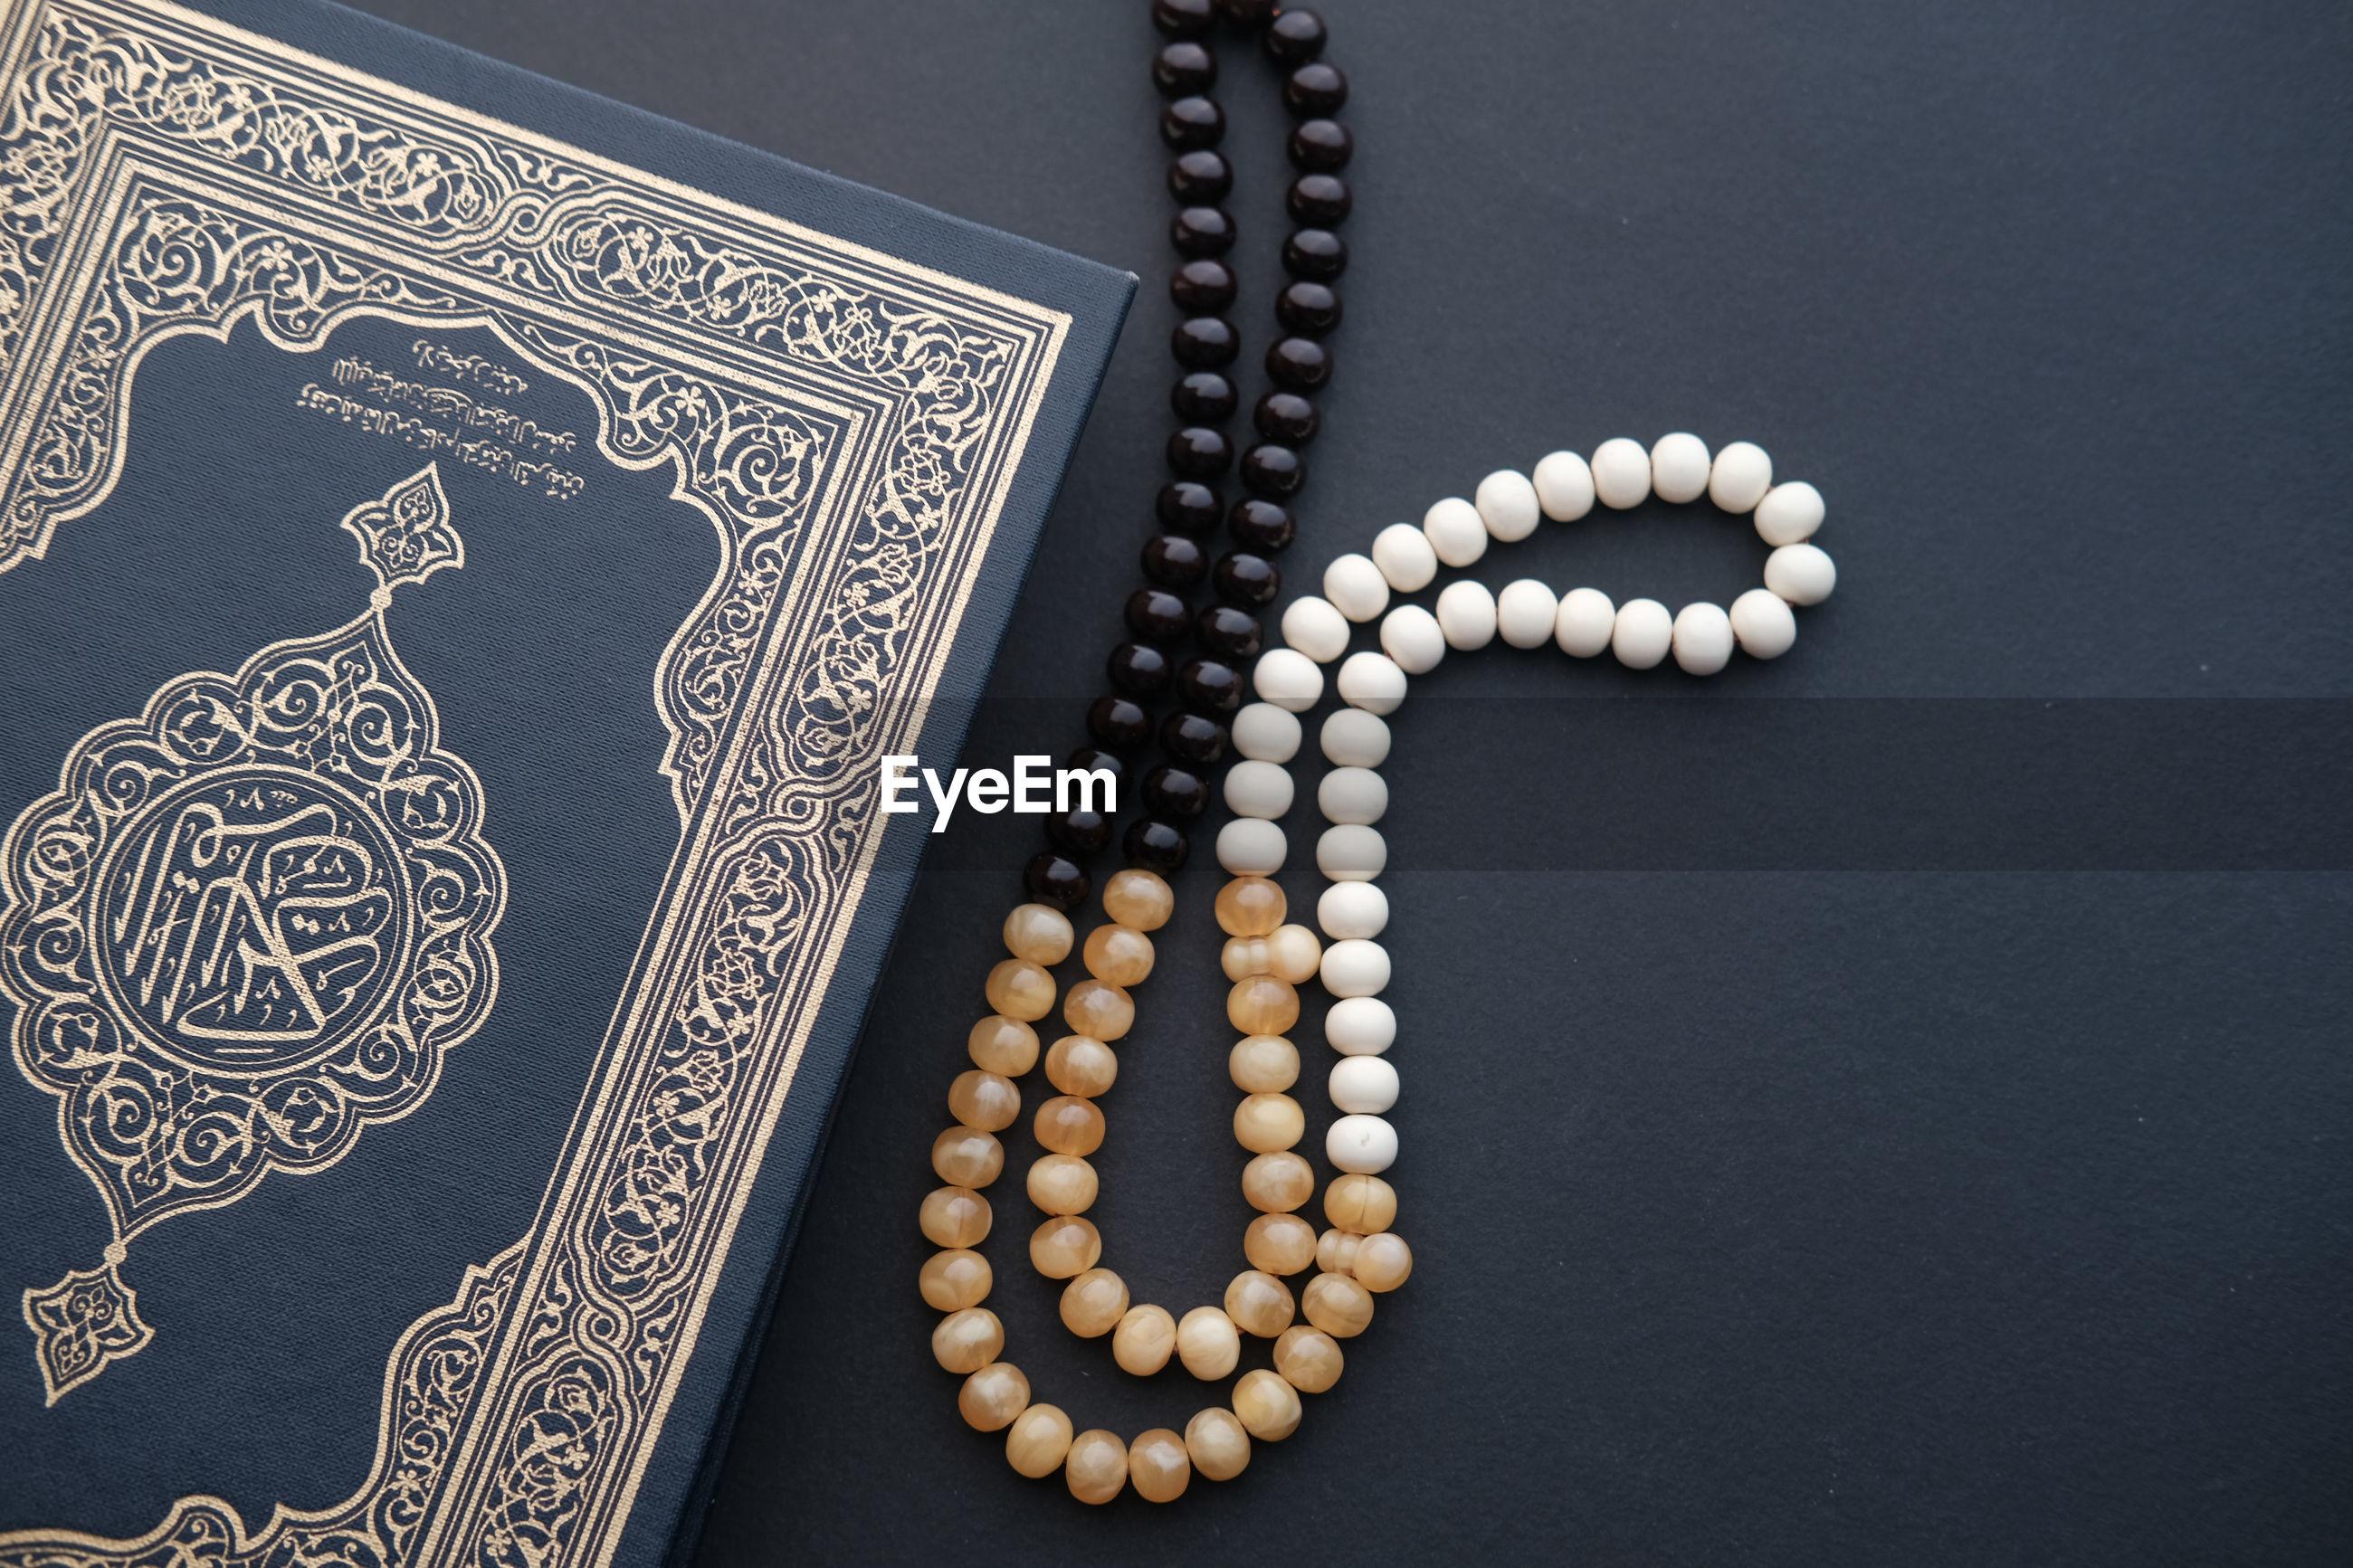 Quran and ramadan concept